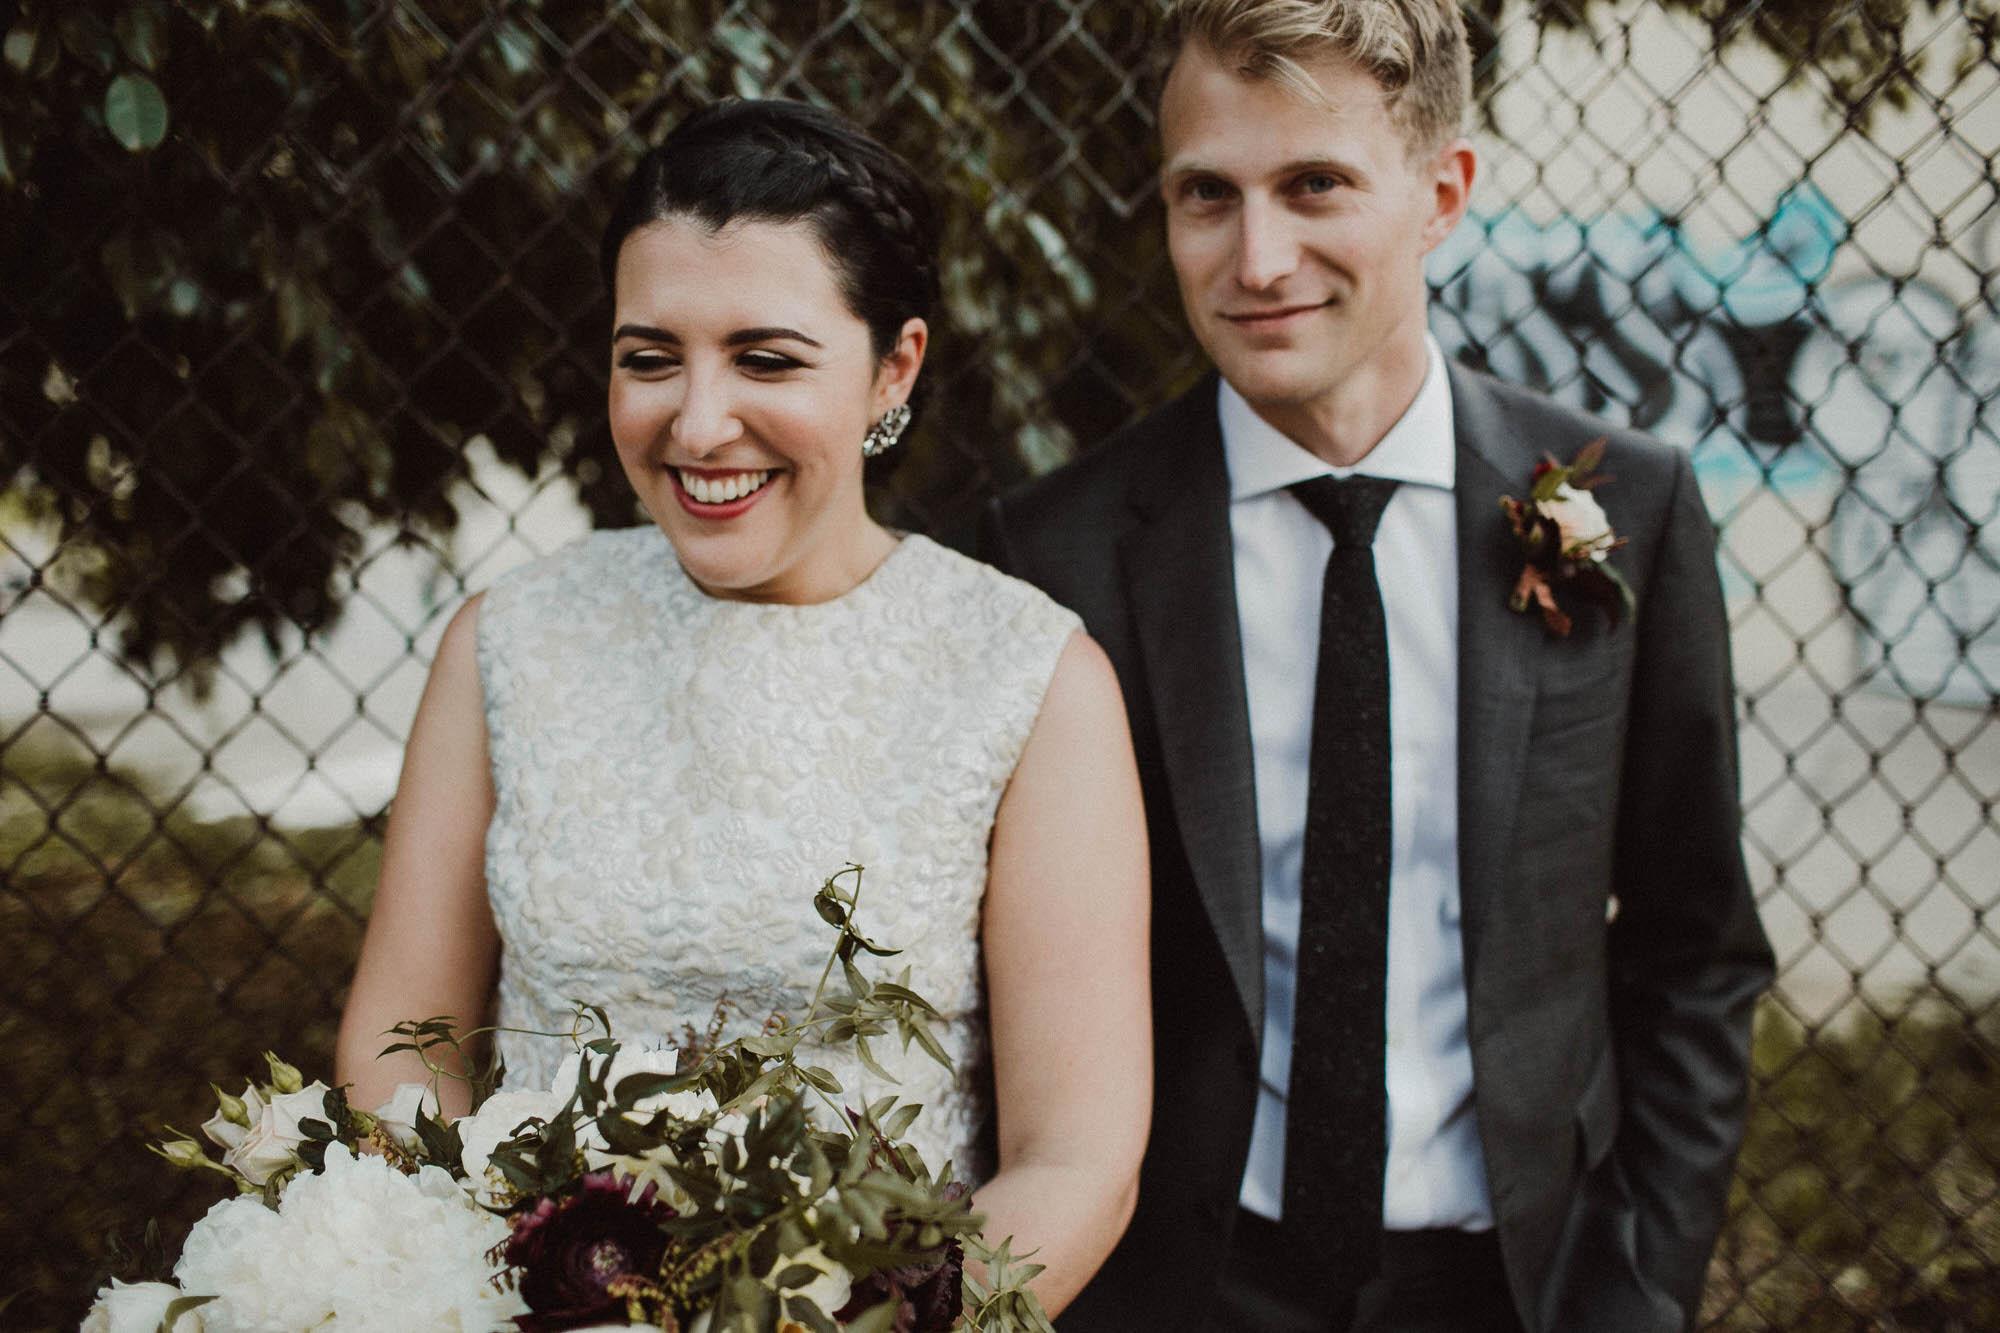 los-angeles-wedding-photographer-millwick-88.jpg